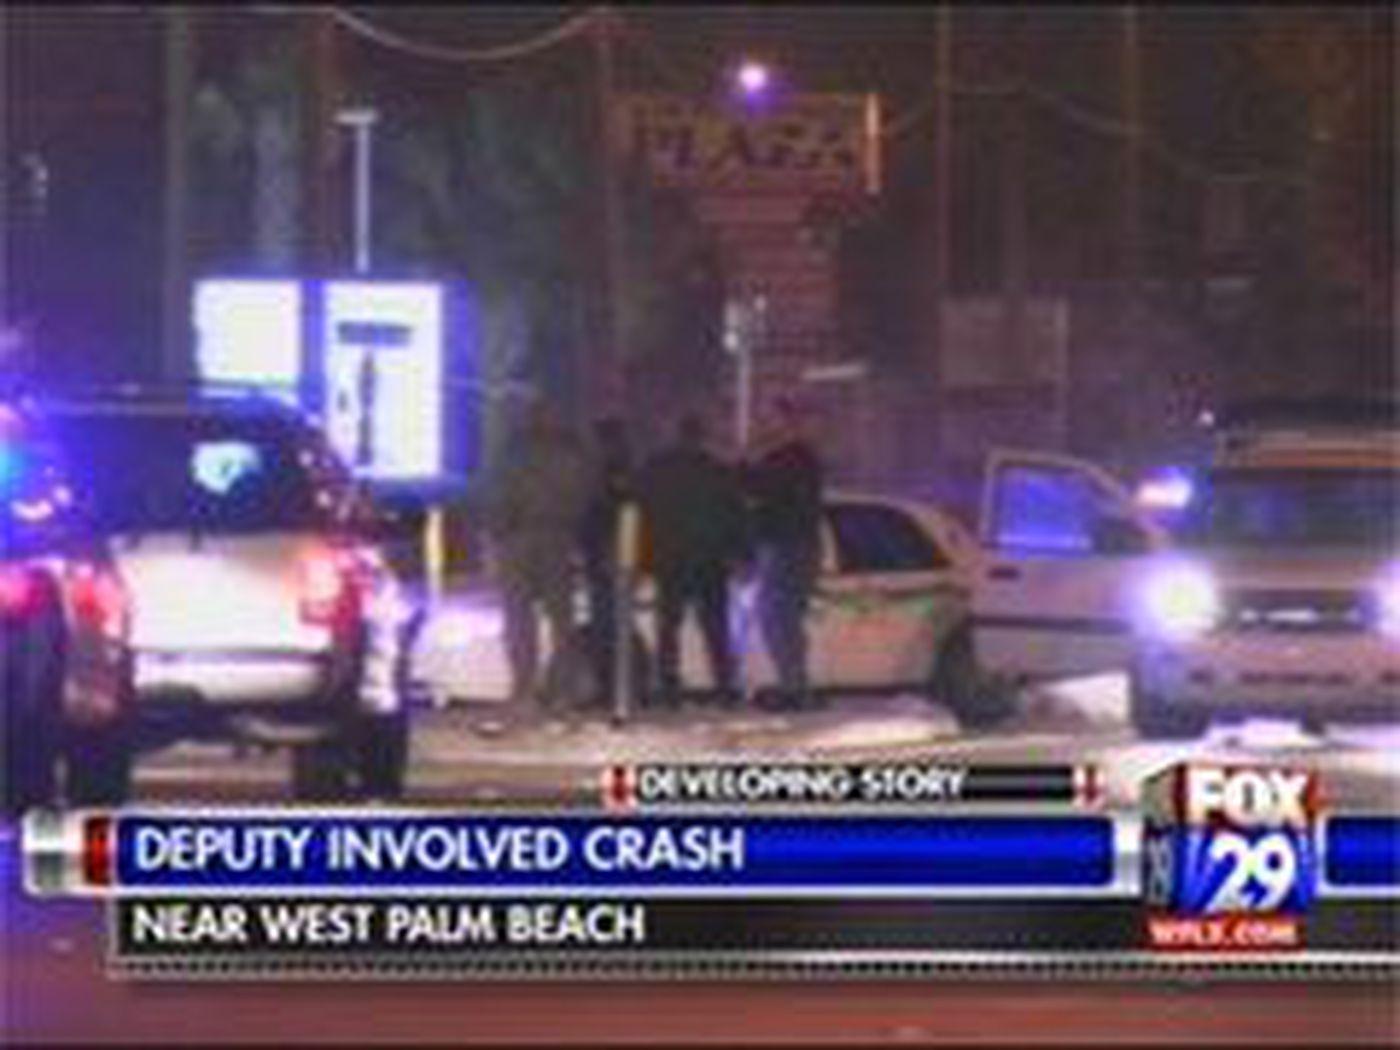 Deputy Involved in Crash